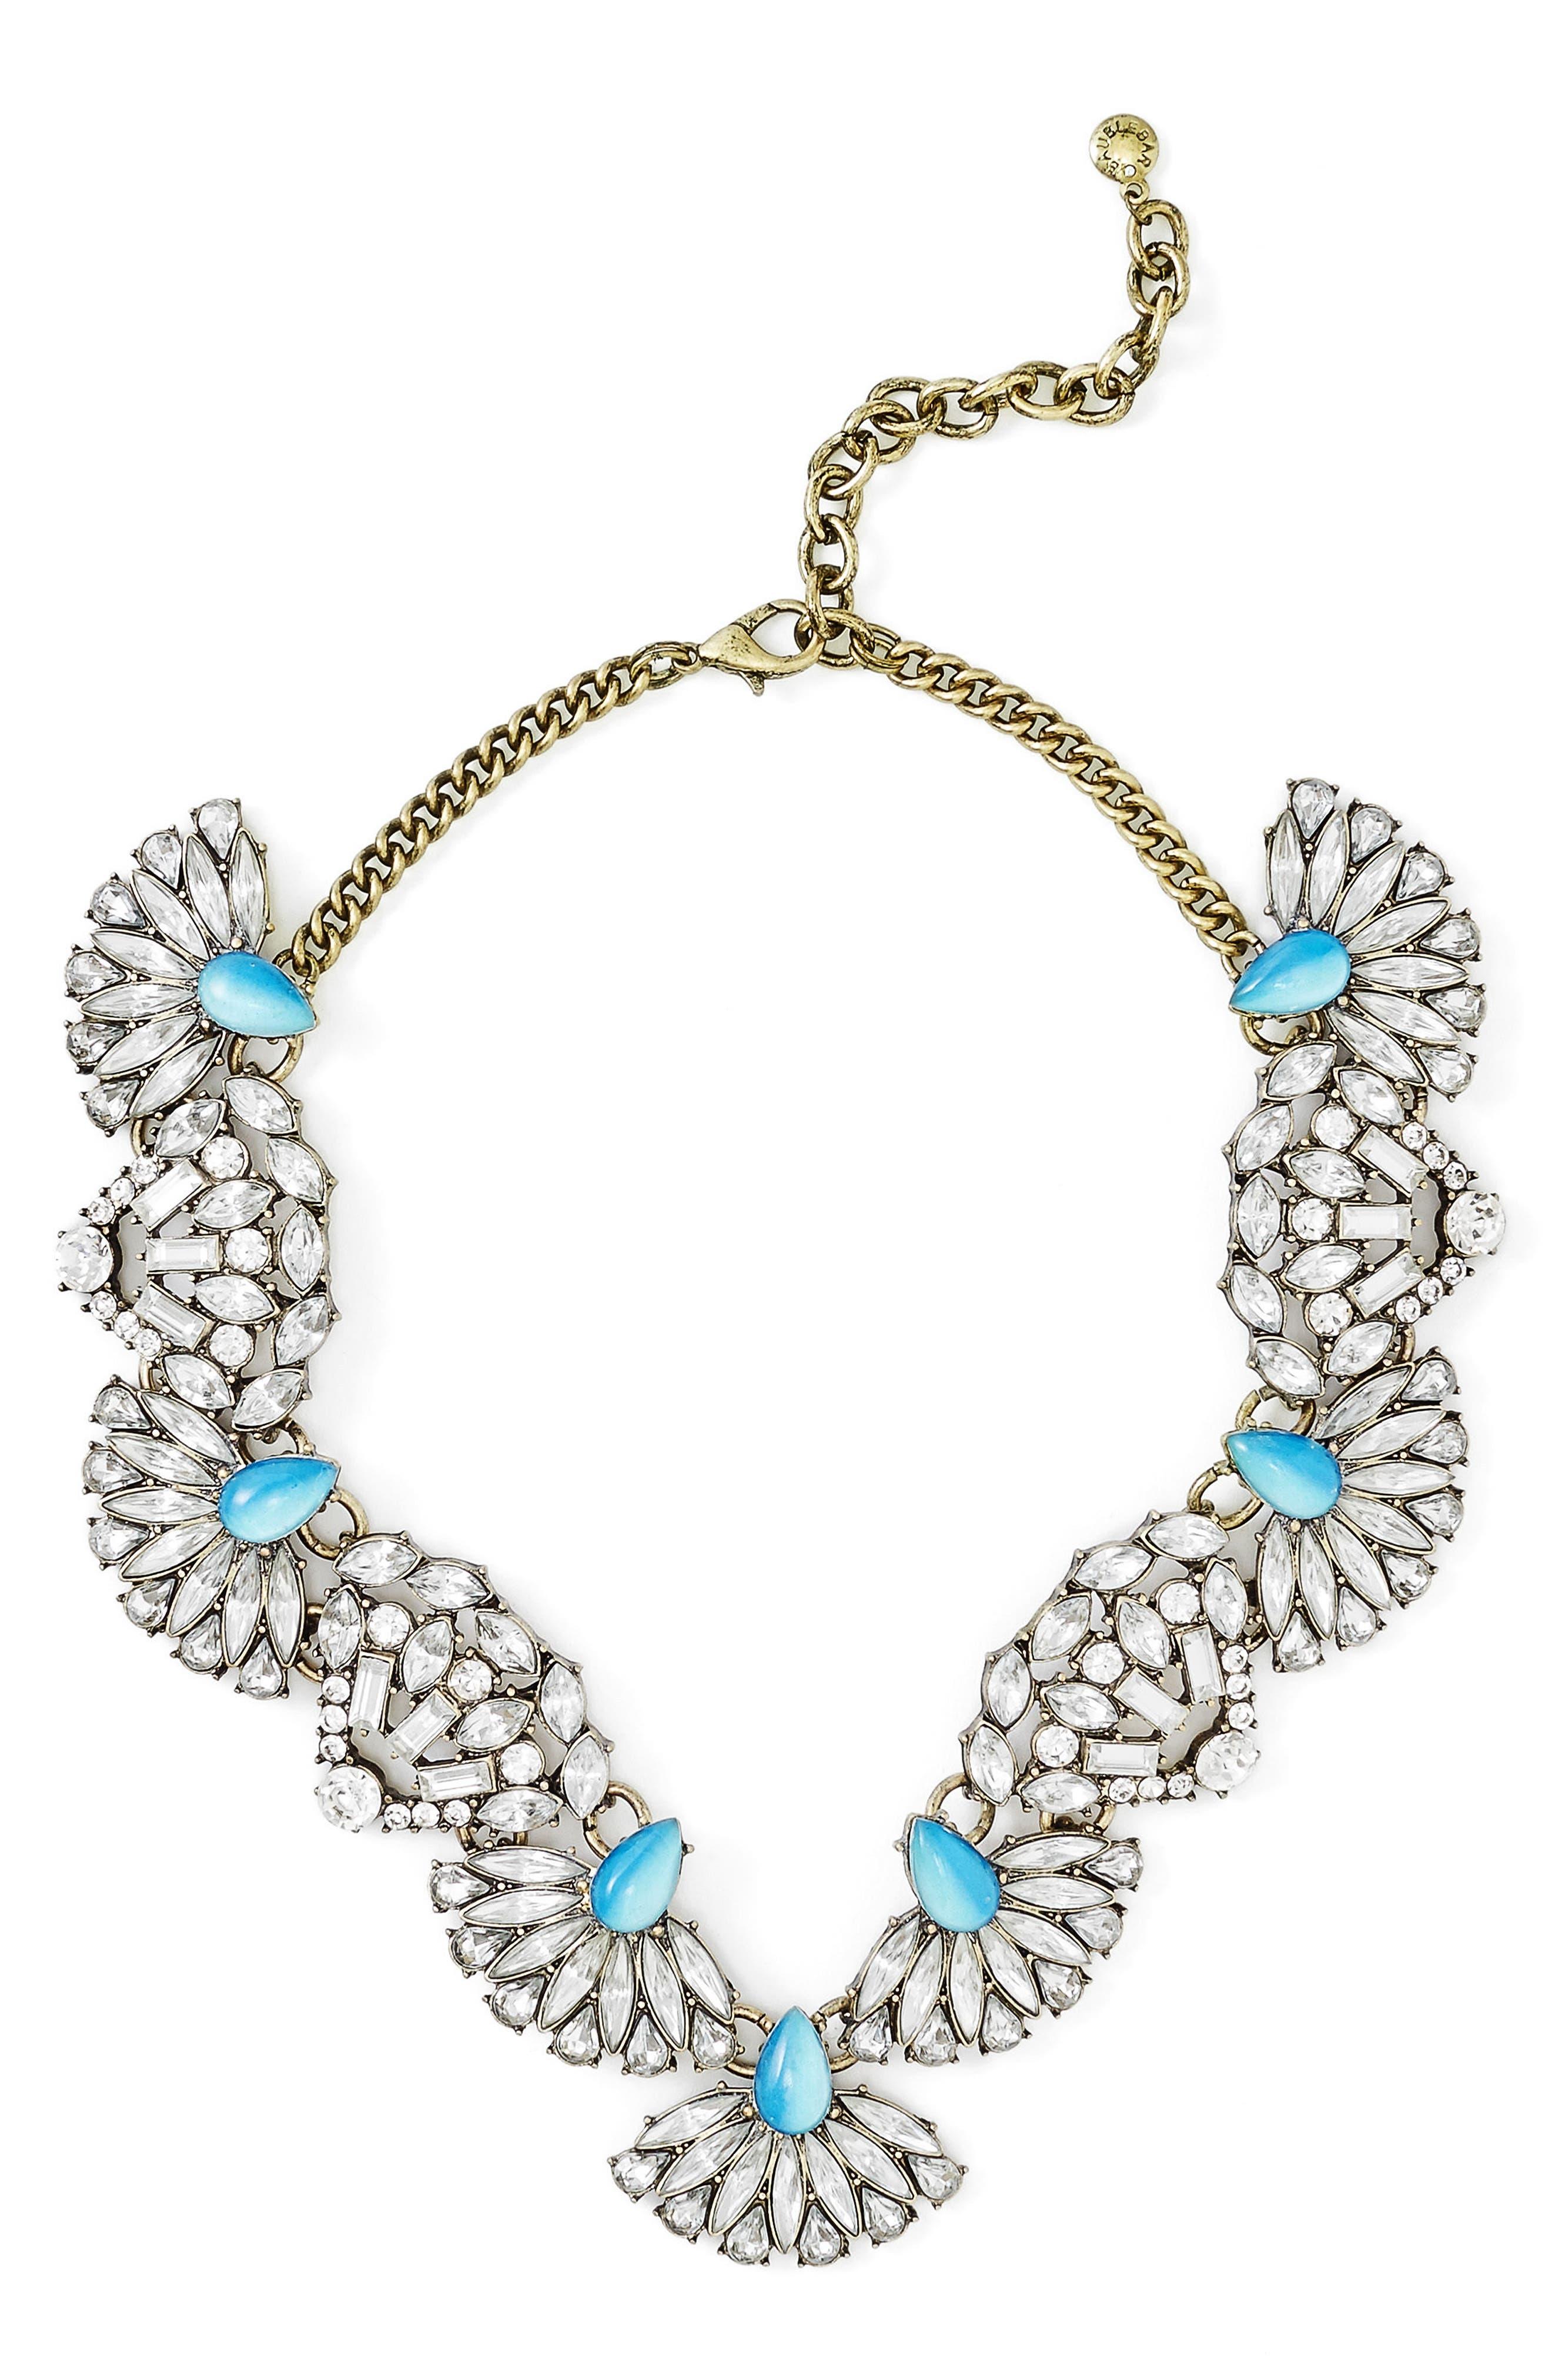 Baublebar Iris Bib Necklace